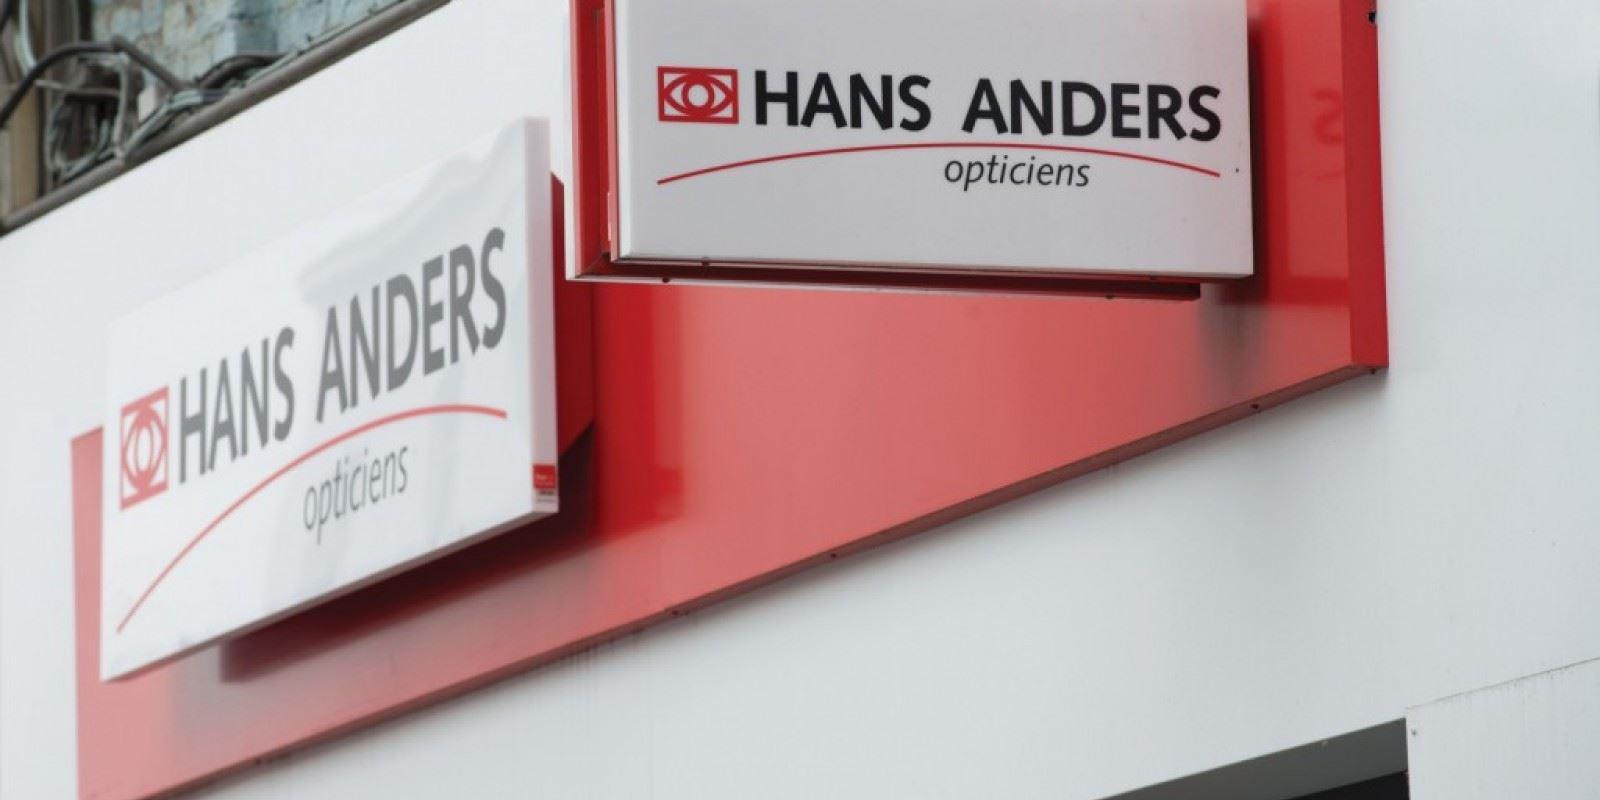 #Hans Anders #BasRetail